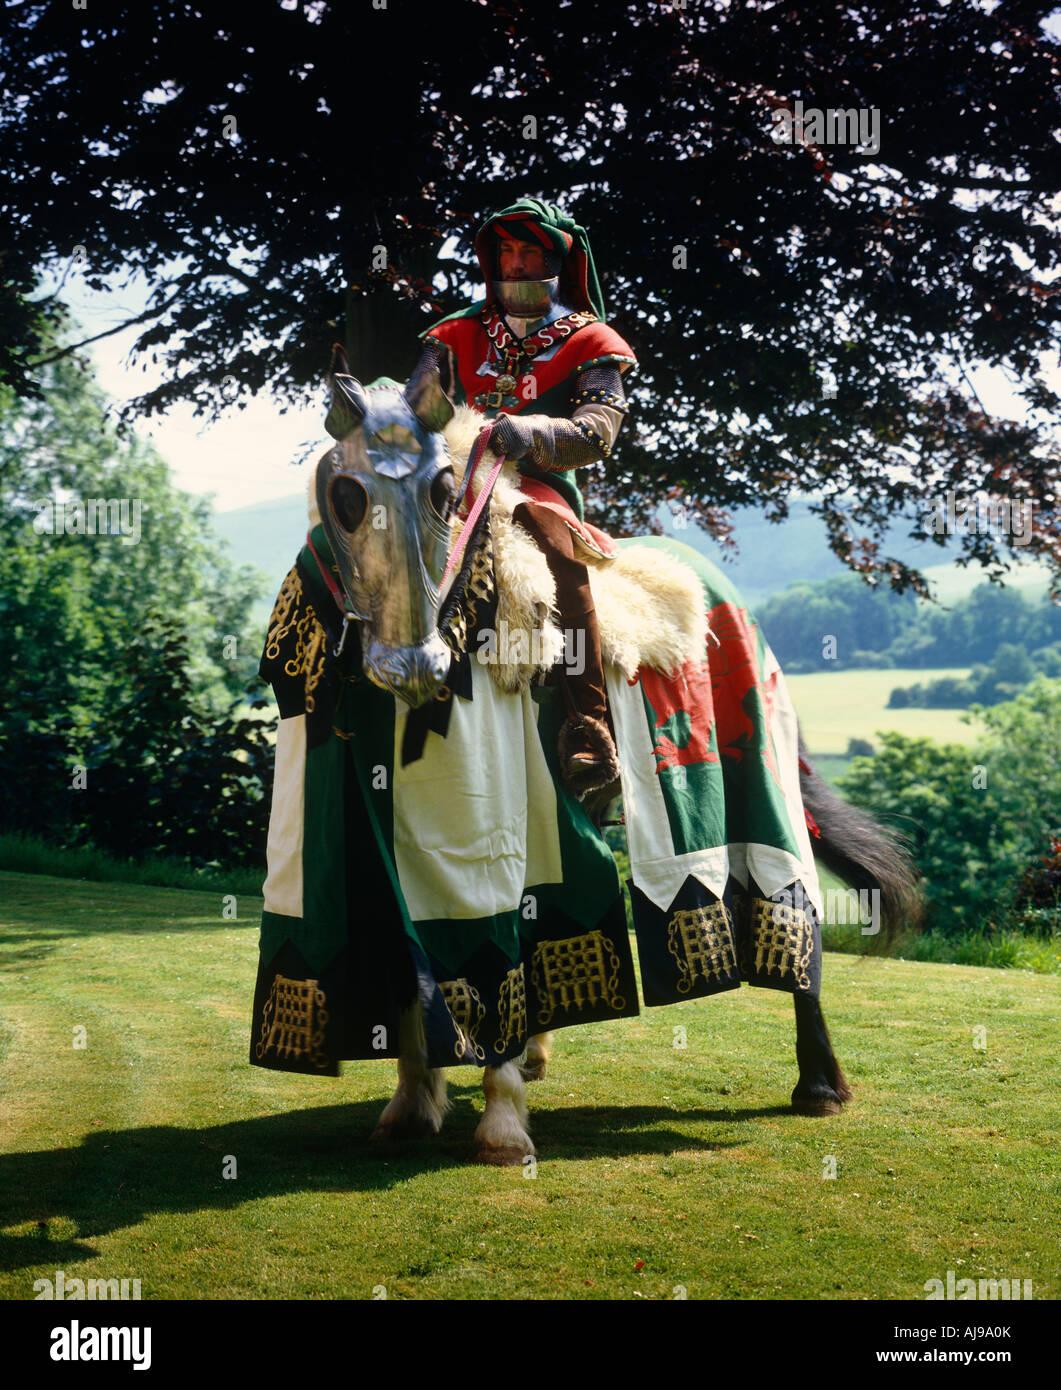 Battle Of Bosworth - Henry Tudor - Stock Image